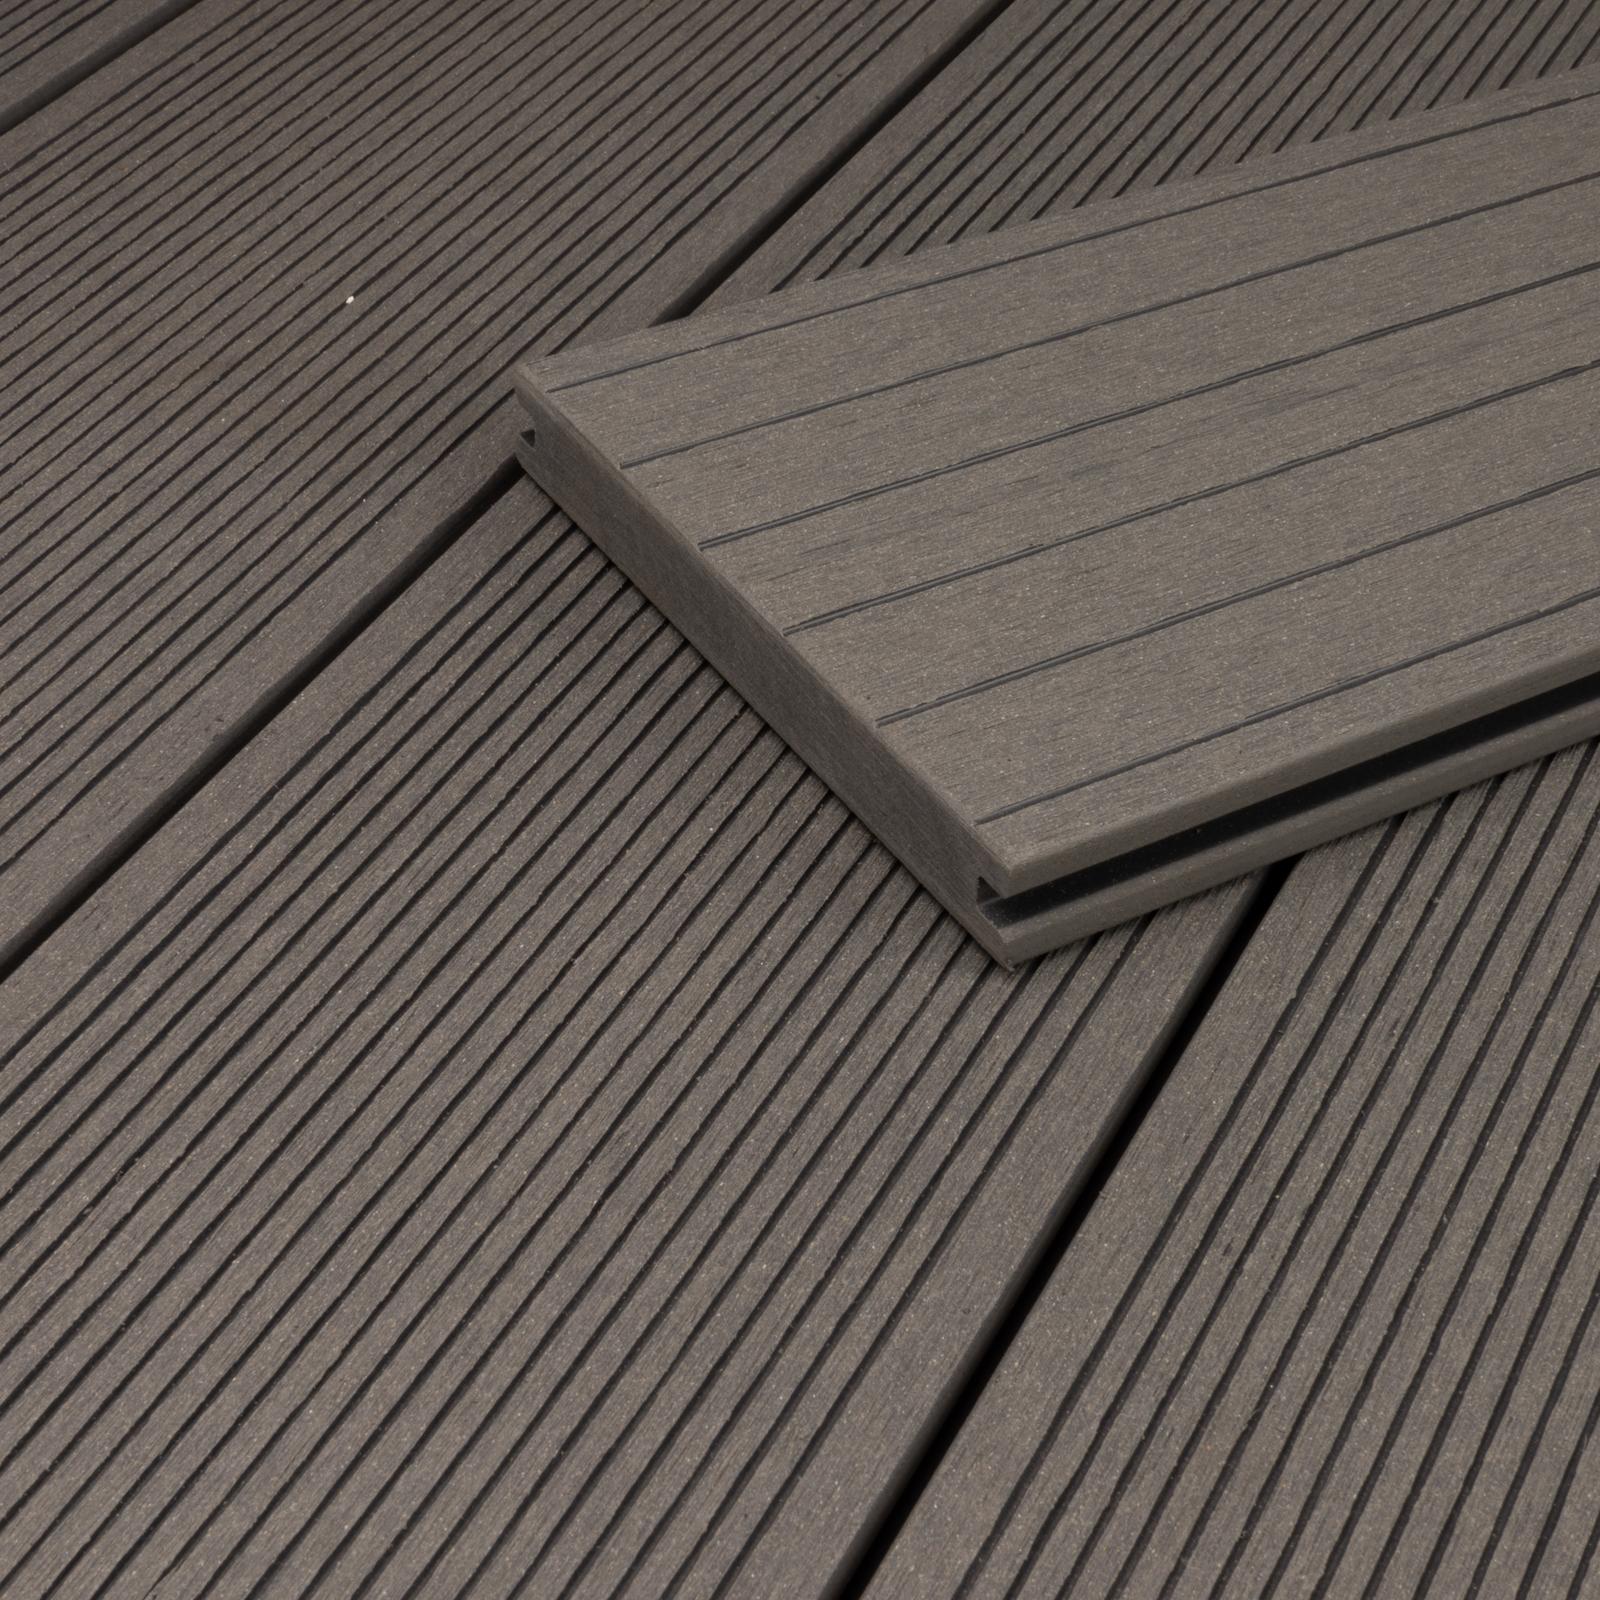 15 m² BPC Terrassendielen 2,90m Grau Terrassenholz Terrassendeck Dielen Holz WPC